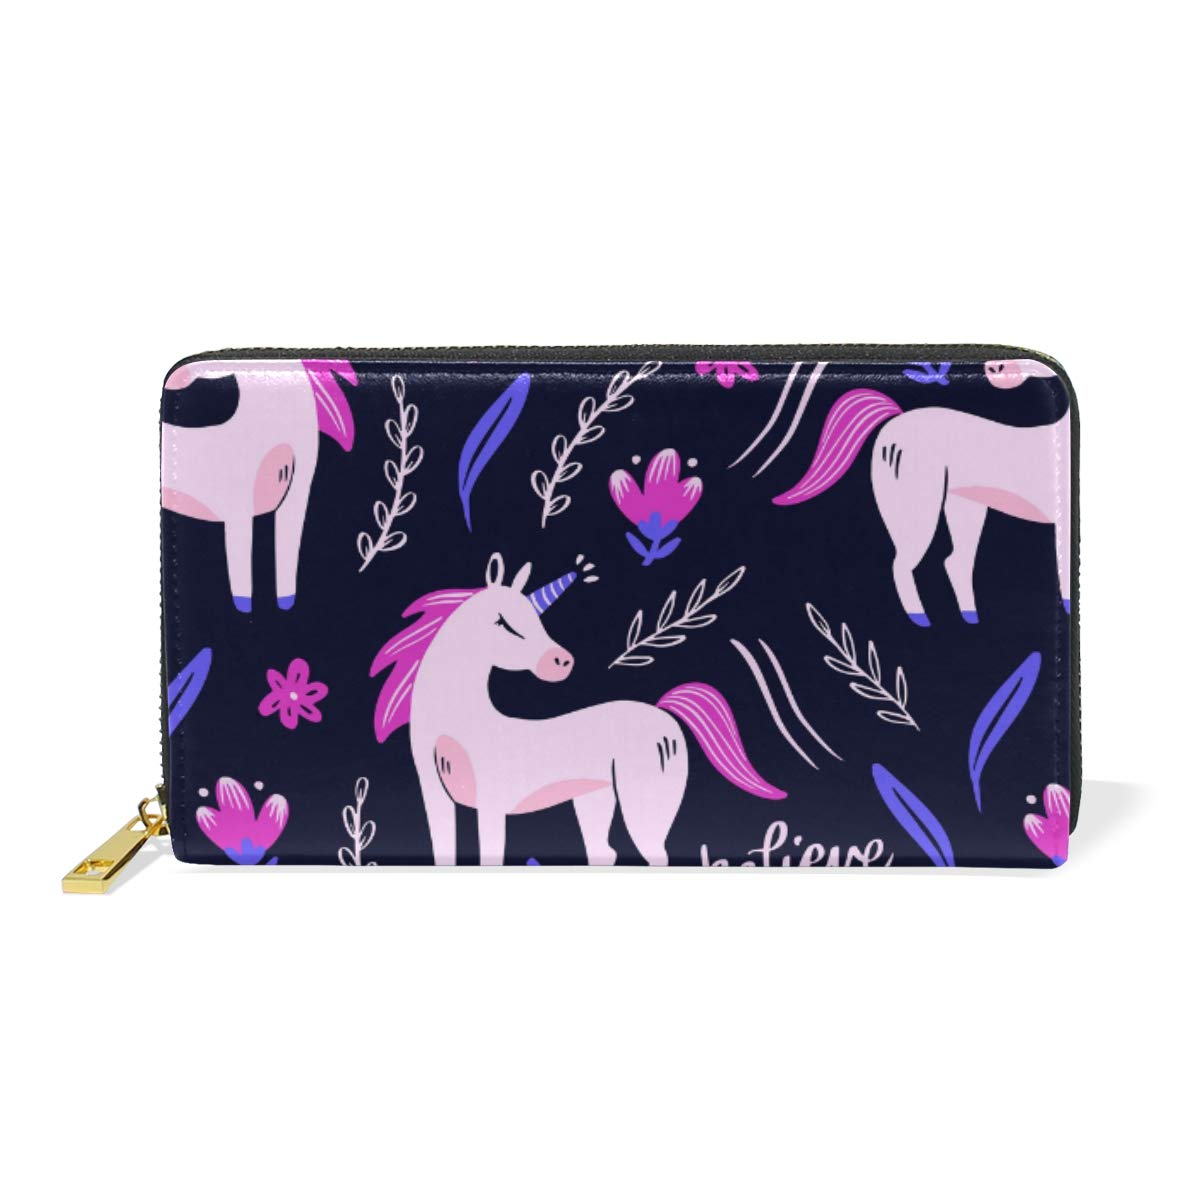 Women Wallet Coin Purse Phone Clutch Pouch Cash Bag,Cute Tiger Pattern Female Girl Card Change Holder Organizer Storage Key Hold Elegant Handbag Gift